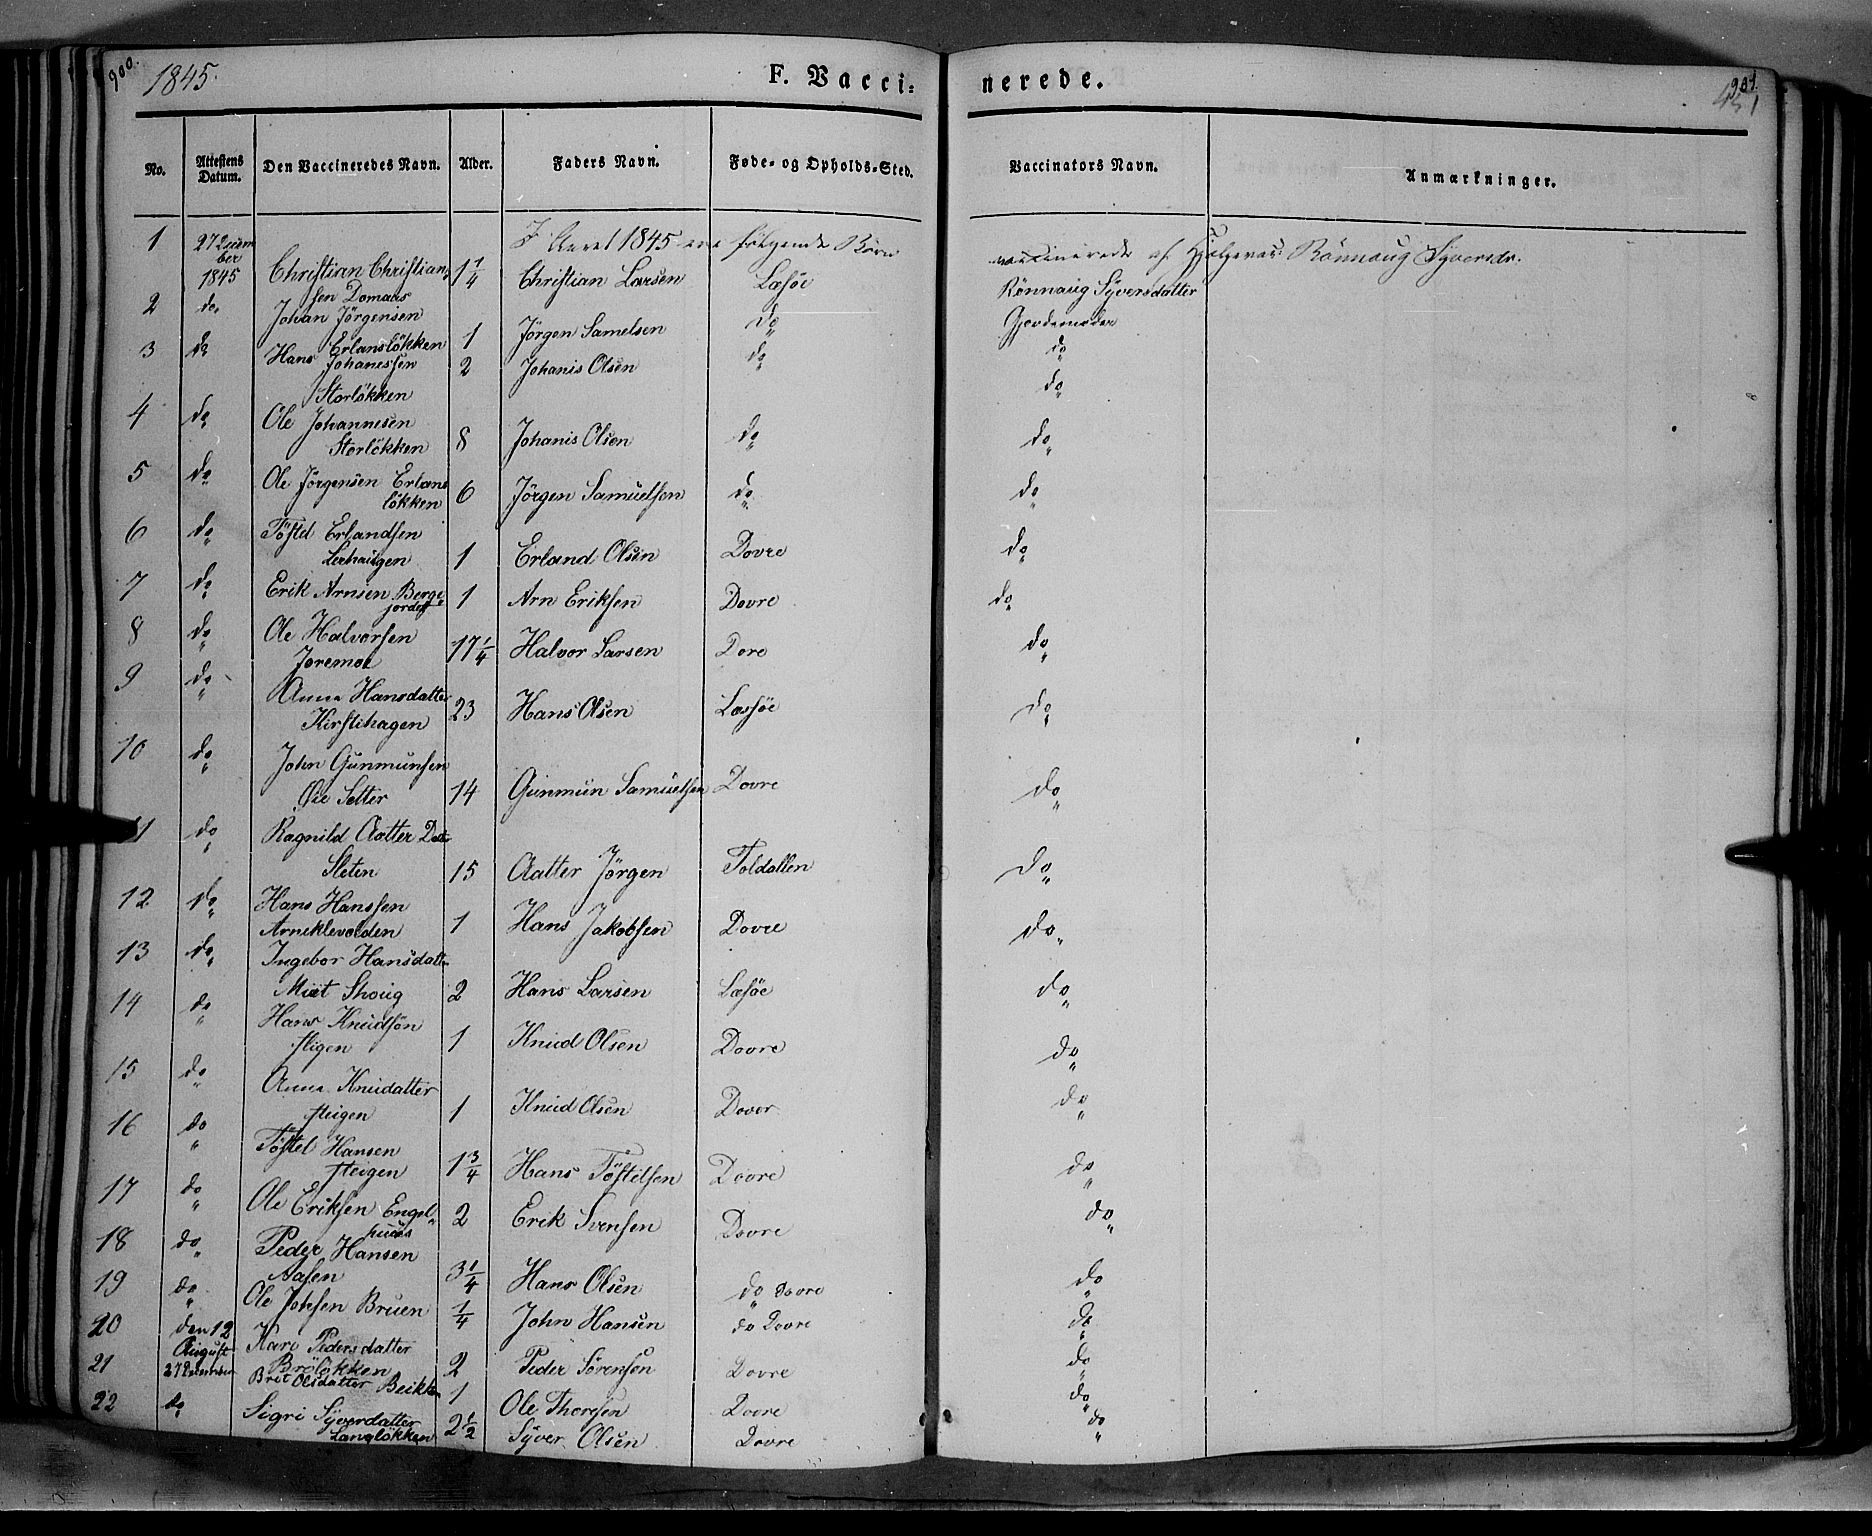 SAH, Lesja prestekontor, Ministerialbok nr. 6B, 1843-1854, s. 900-901